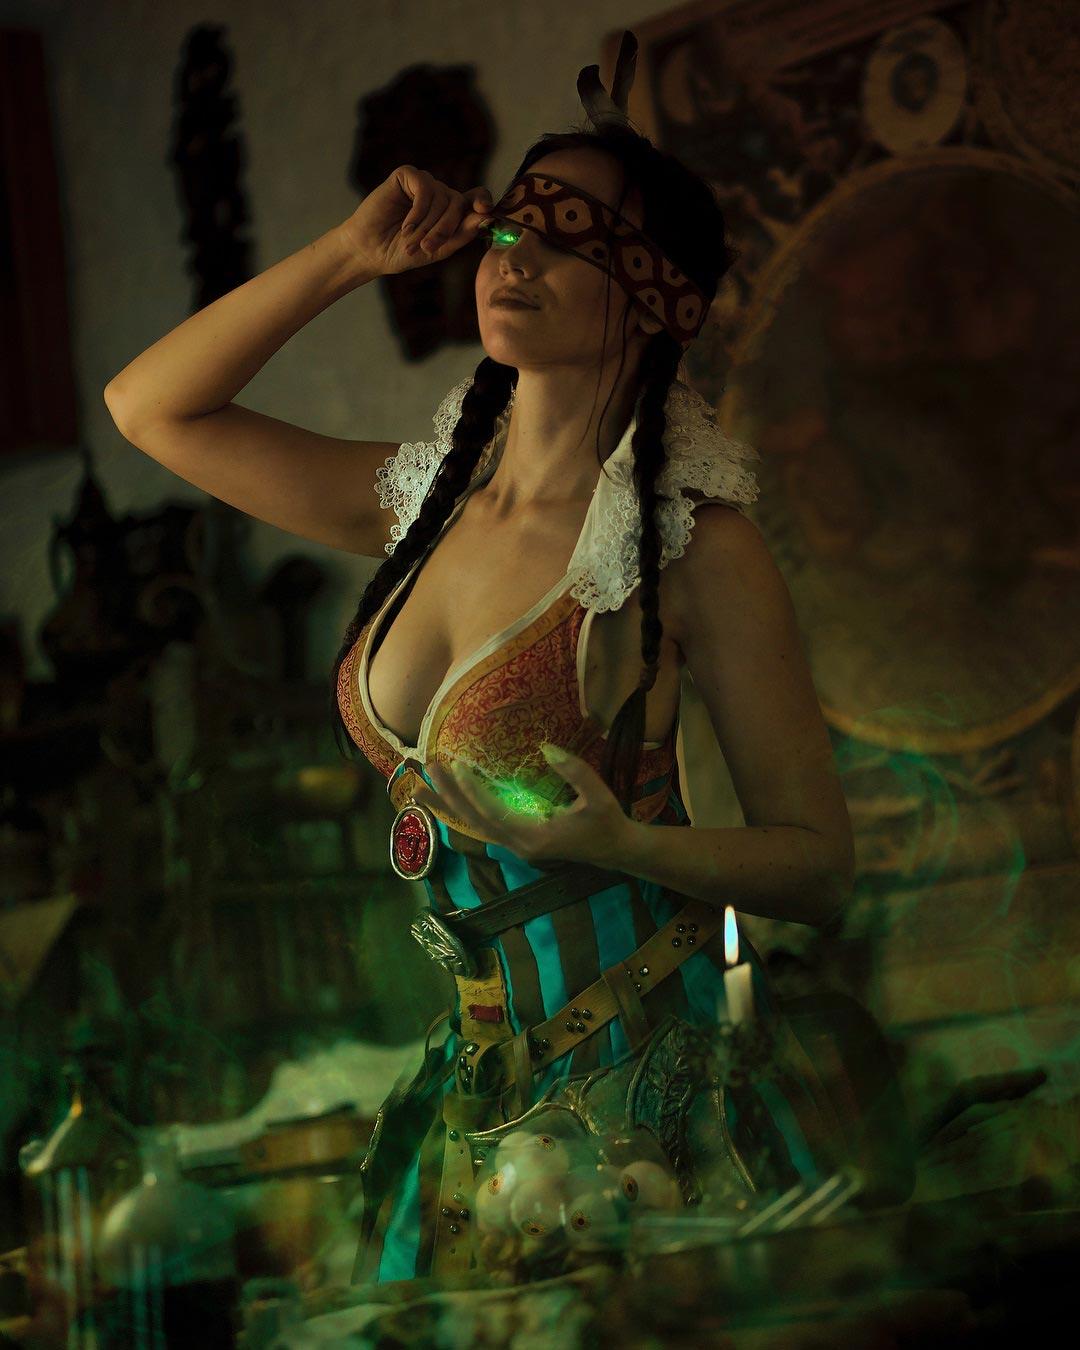 косплей по The Witcher Филиппа Эйльхарт Freya Veles